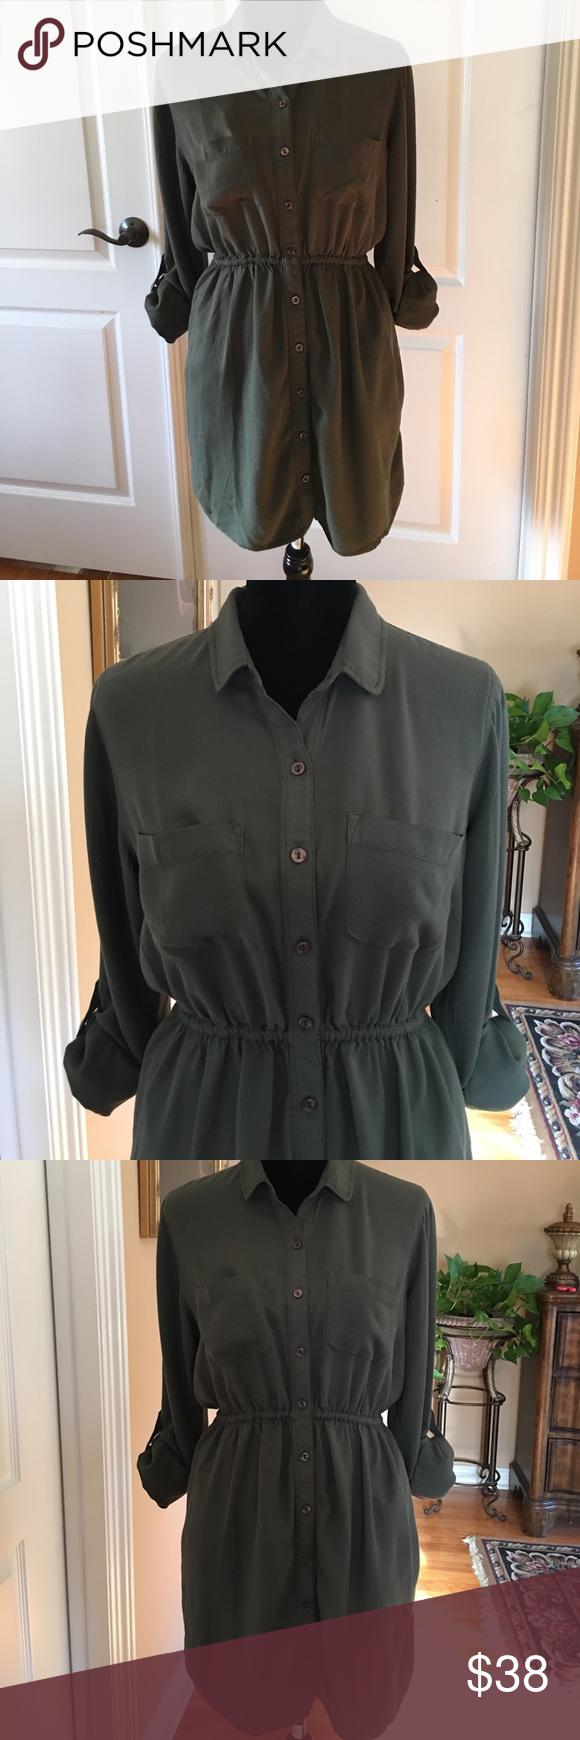 Heels for dark green dress  Urban Outfitters Shirt Dress by BDG